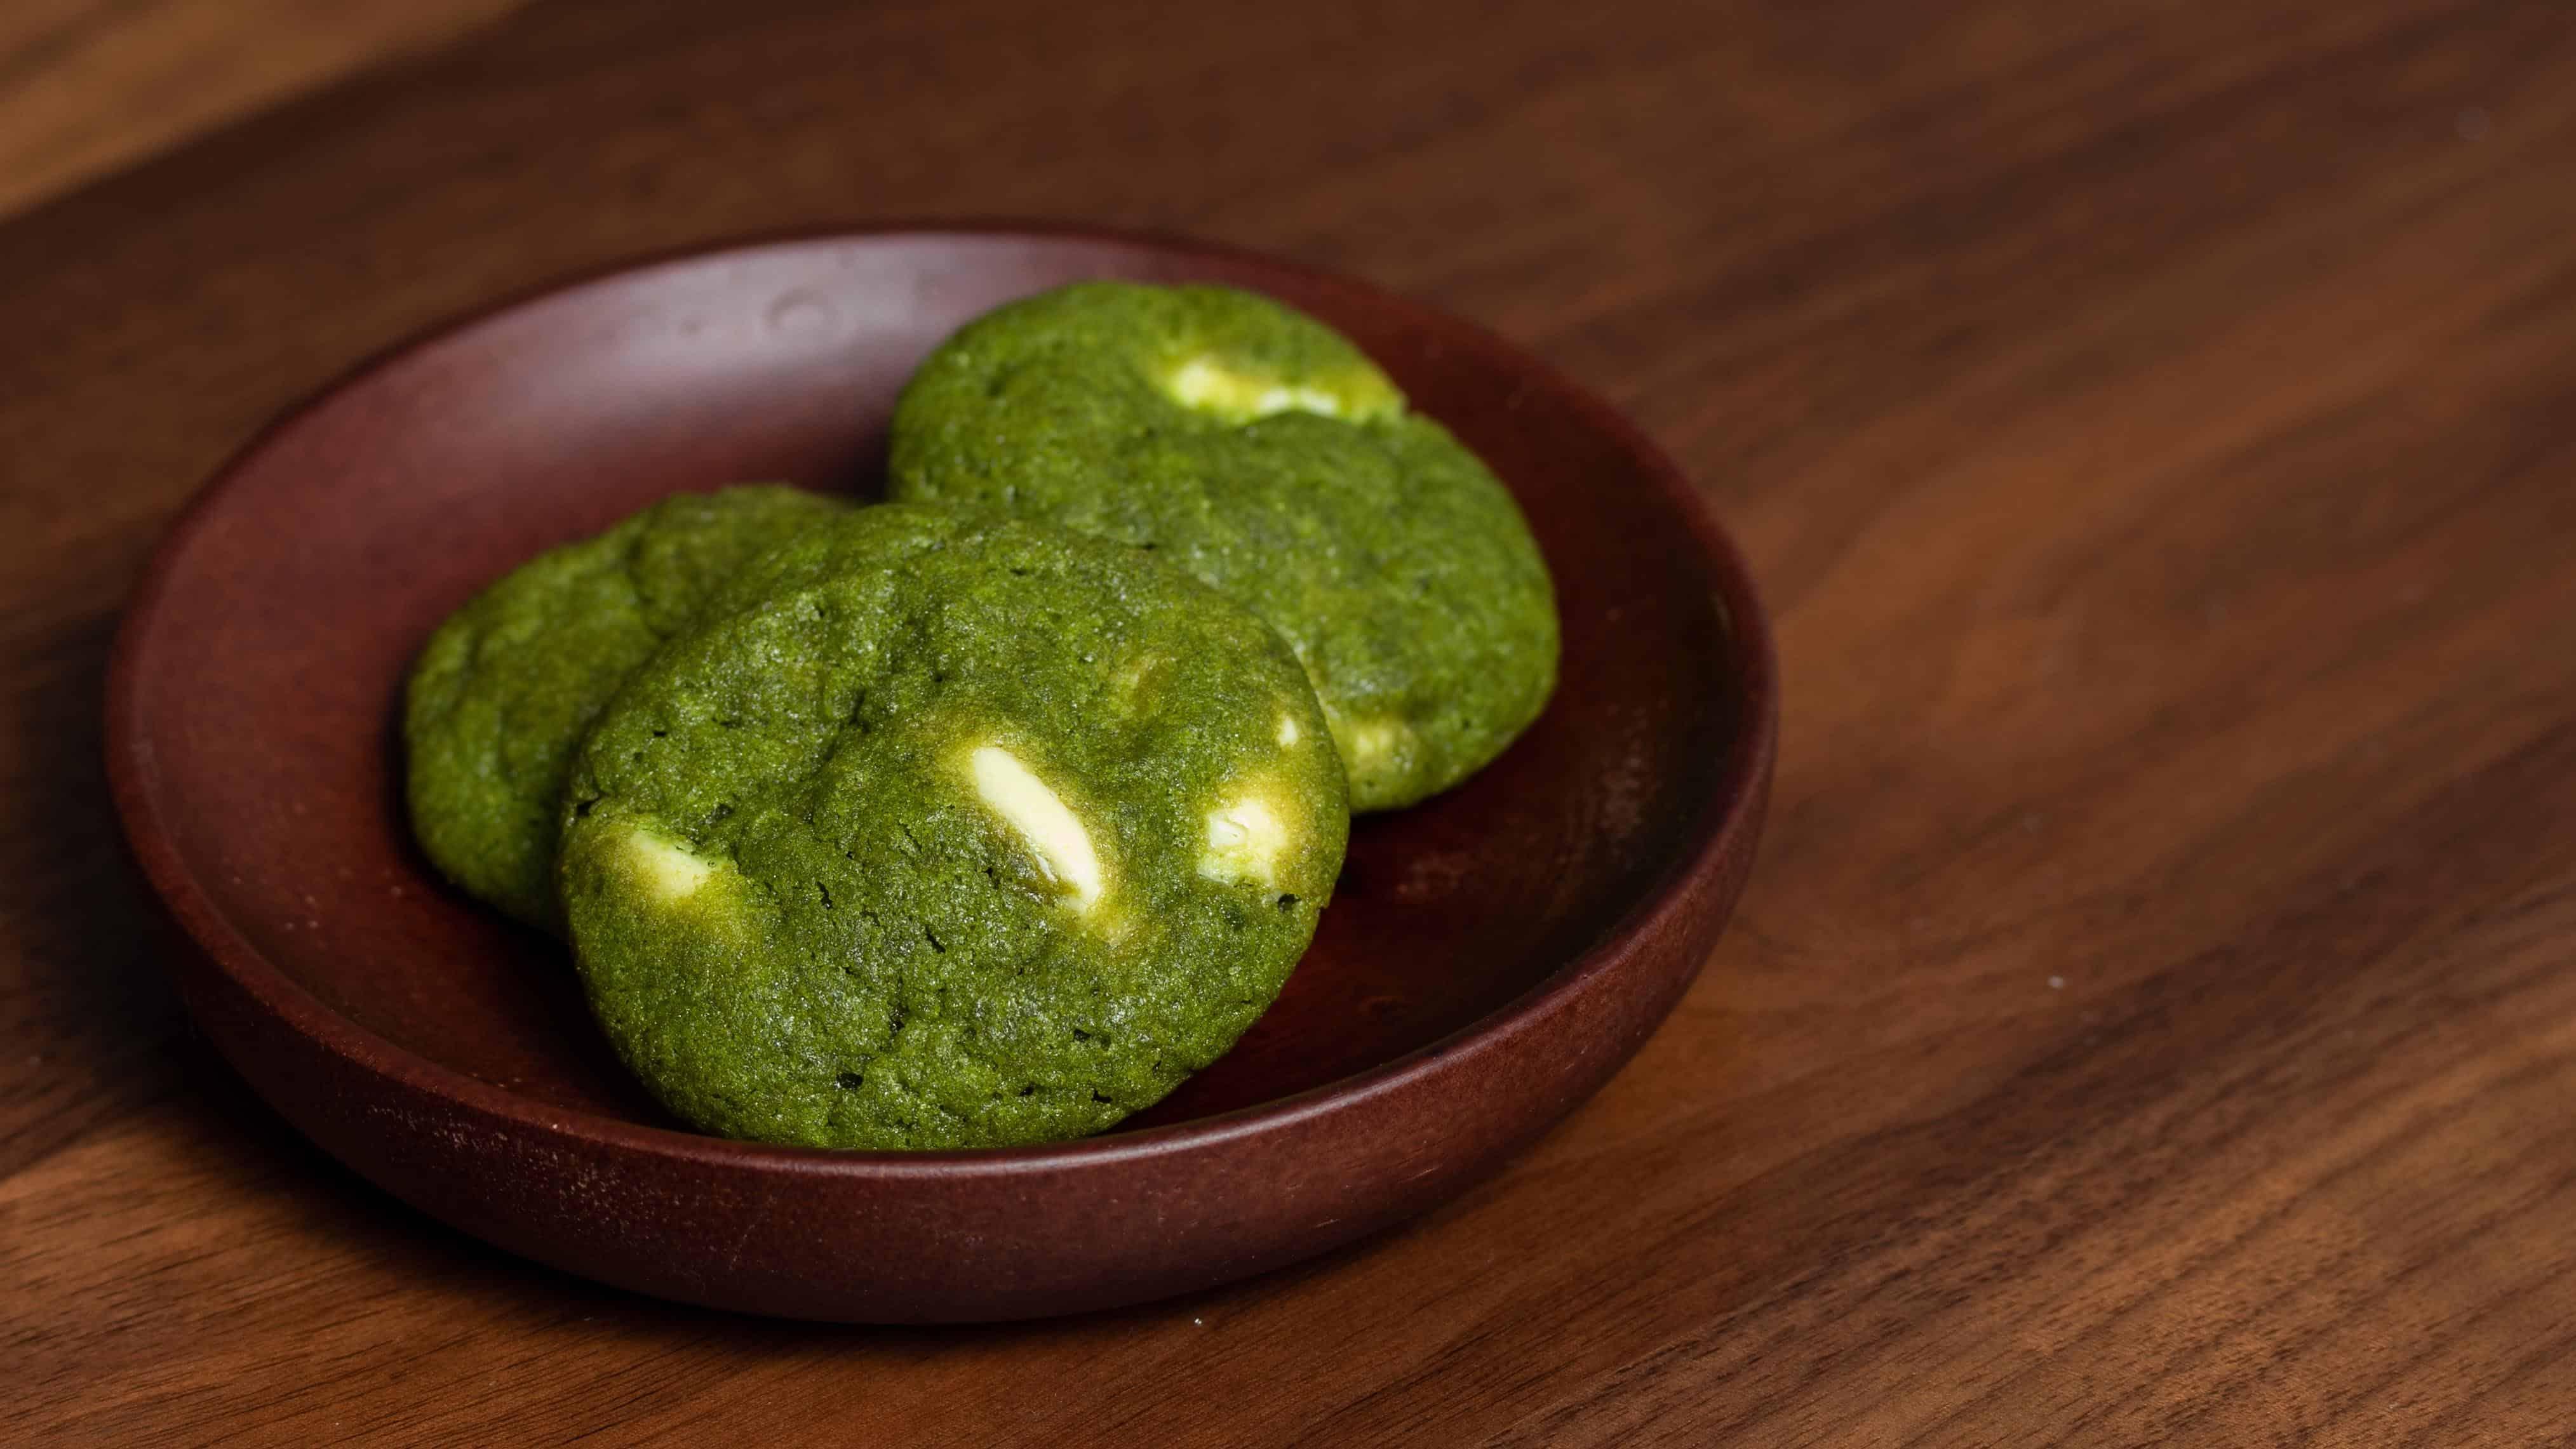 matcha green tea cookie on plate